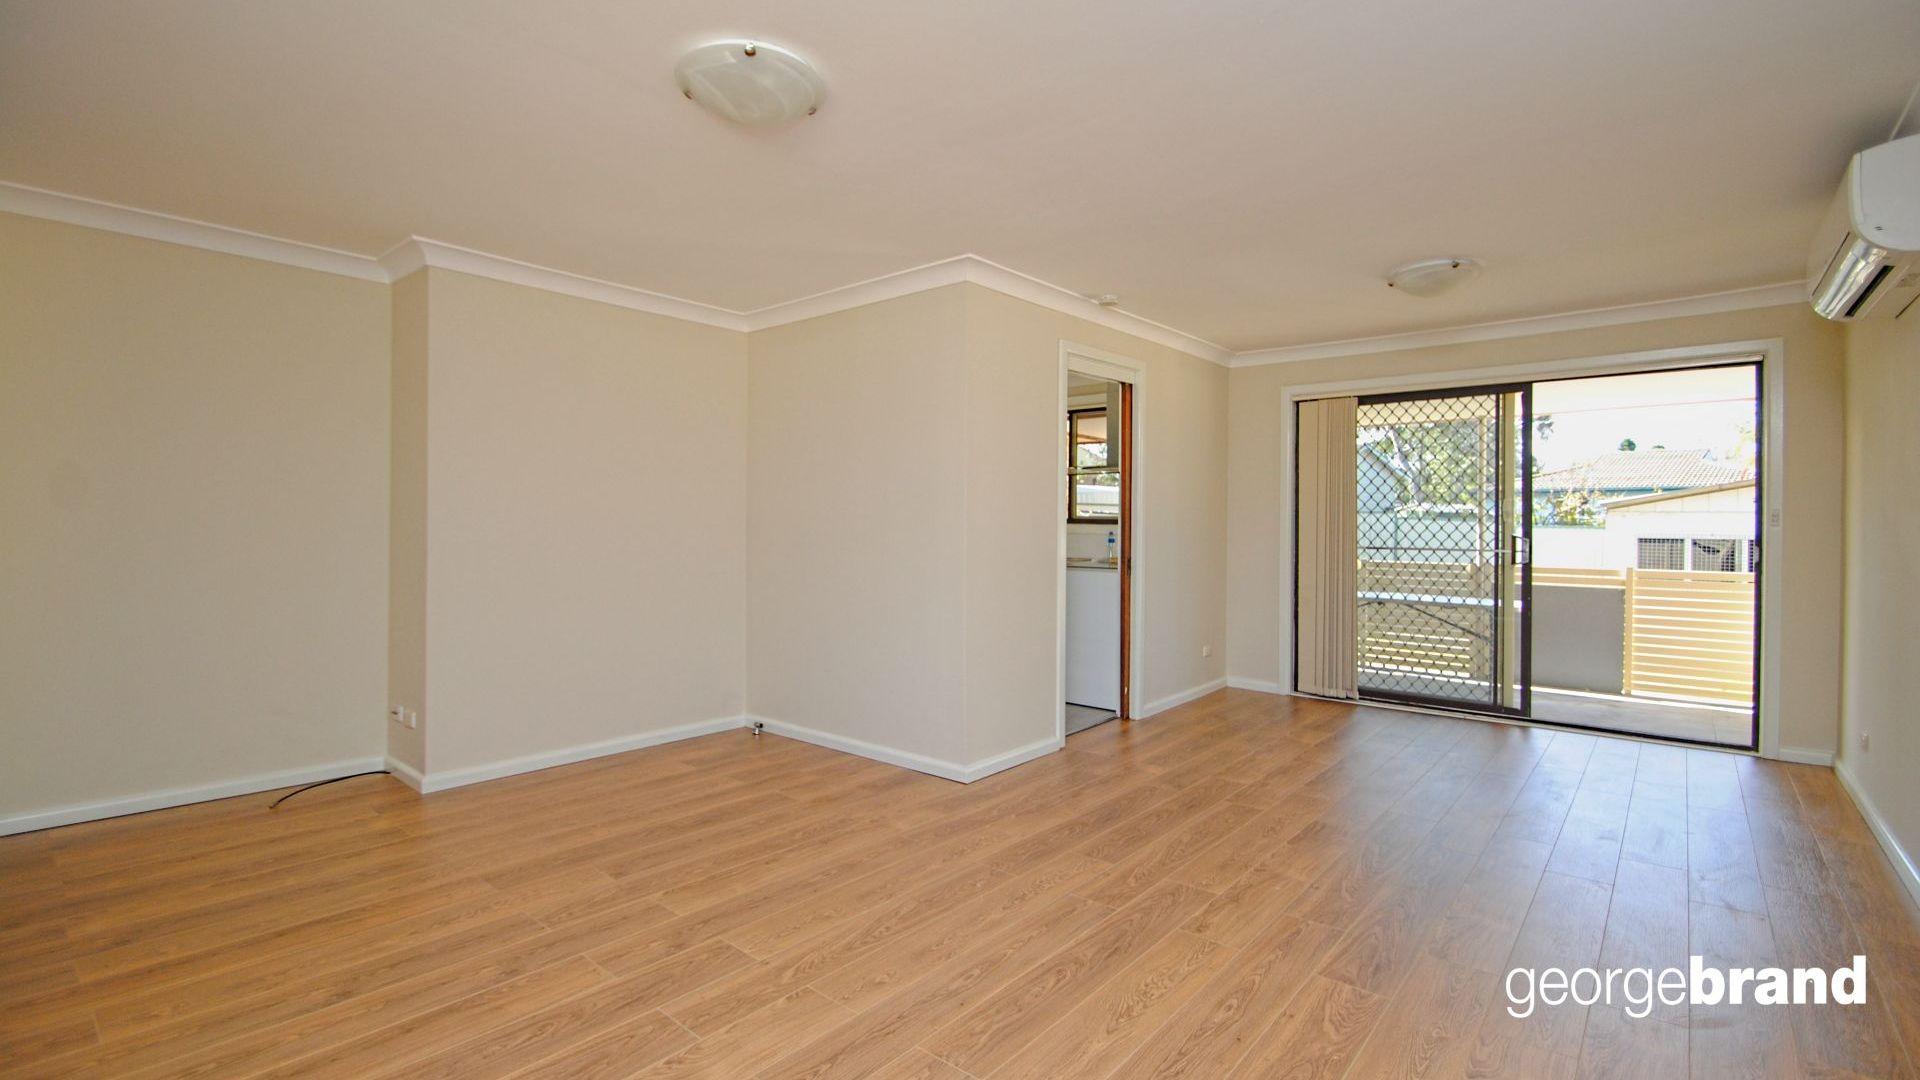 21 Shropshire Street, Gorokan NSW 2263, Image 1